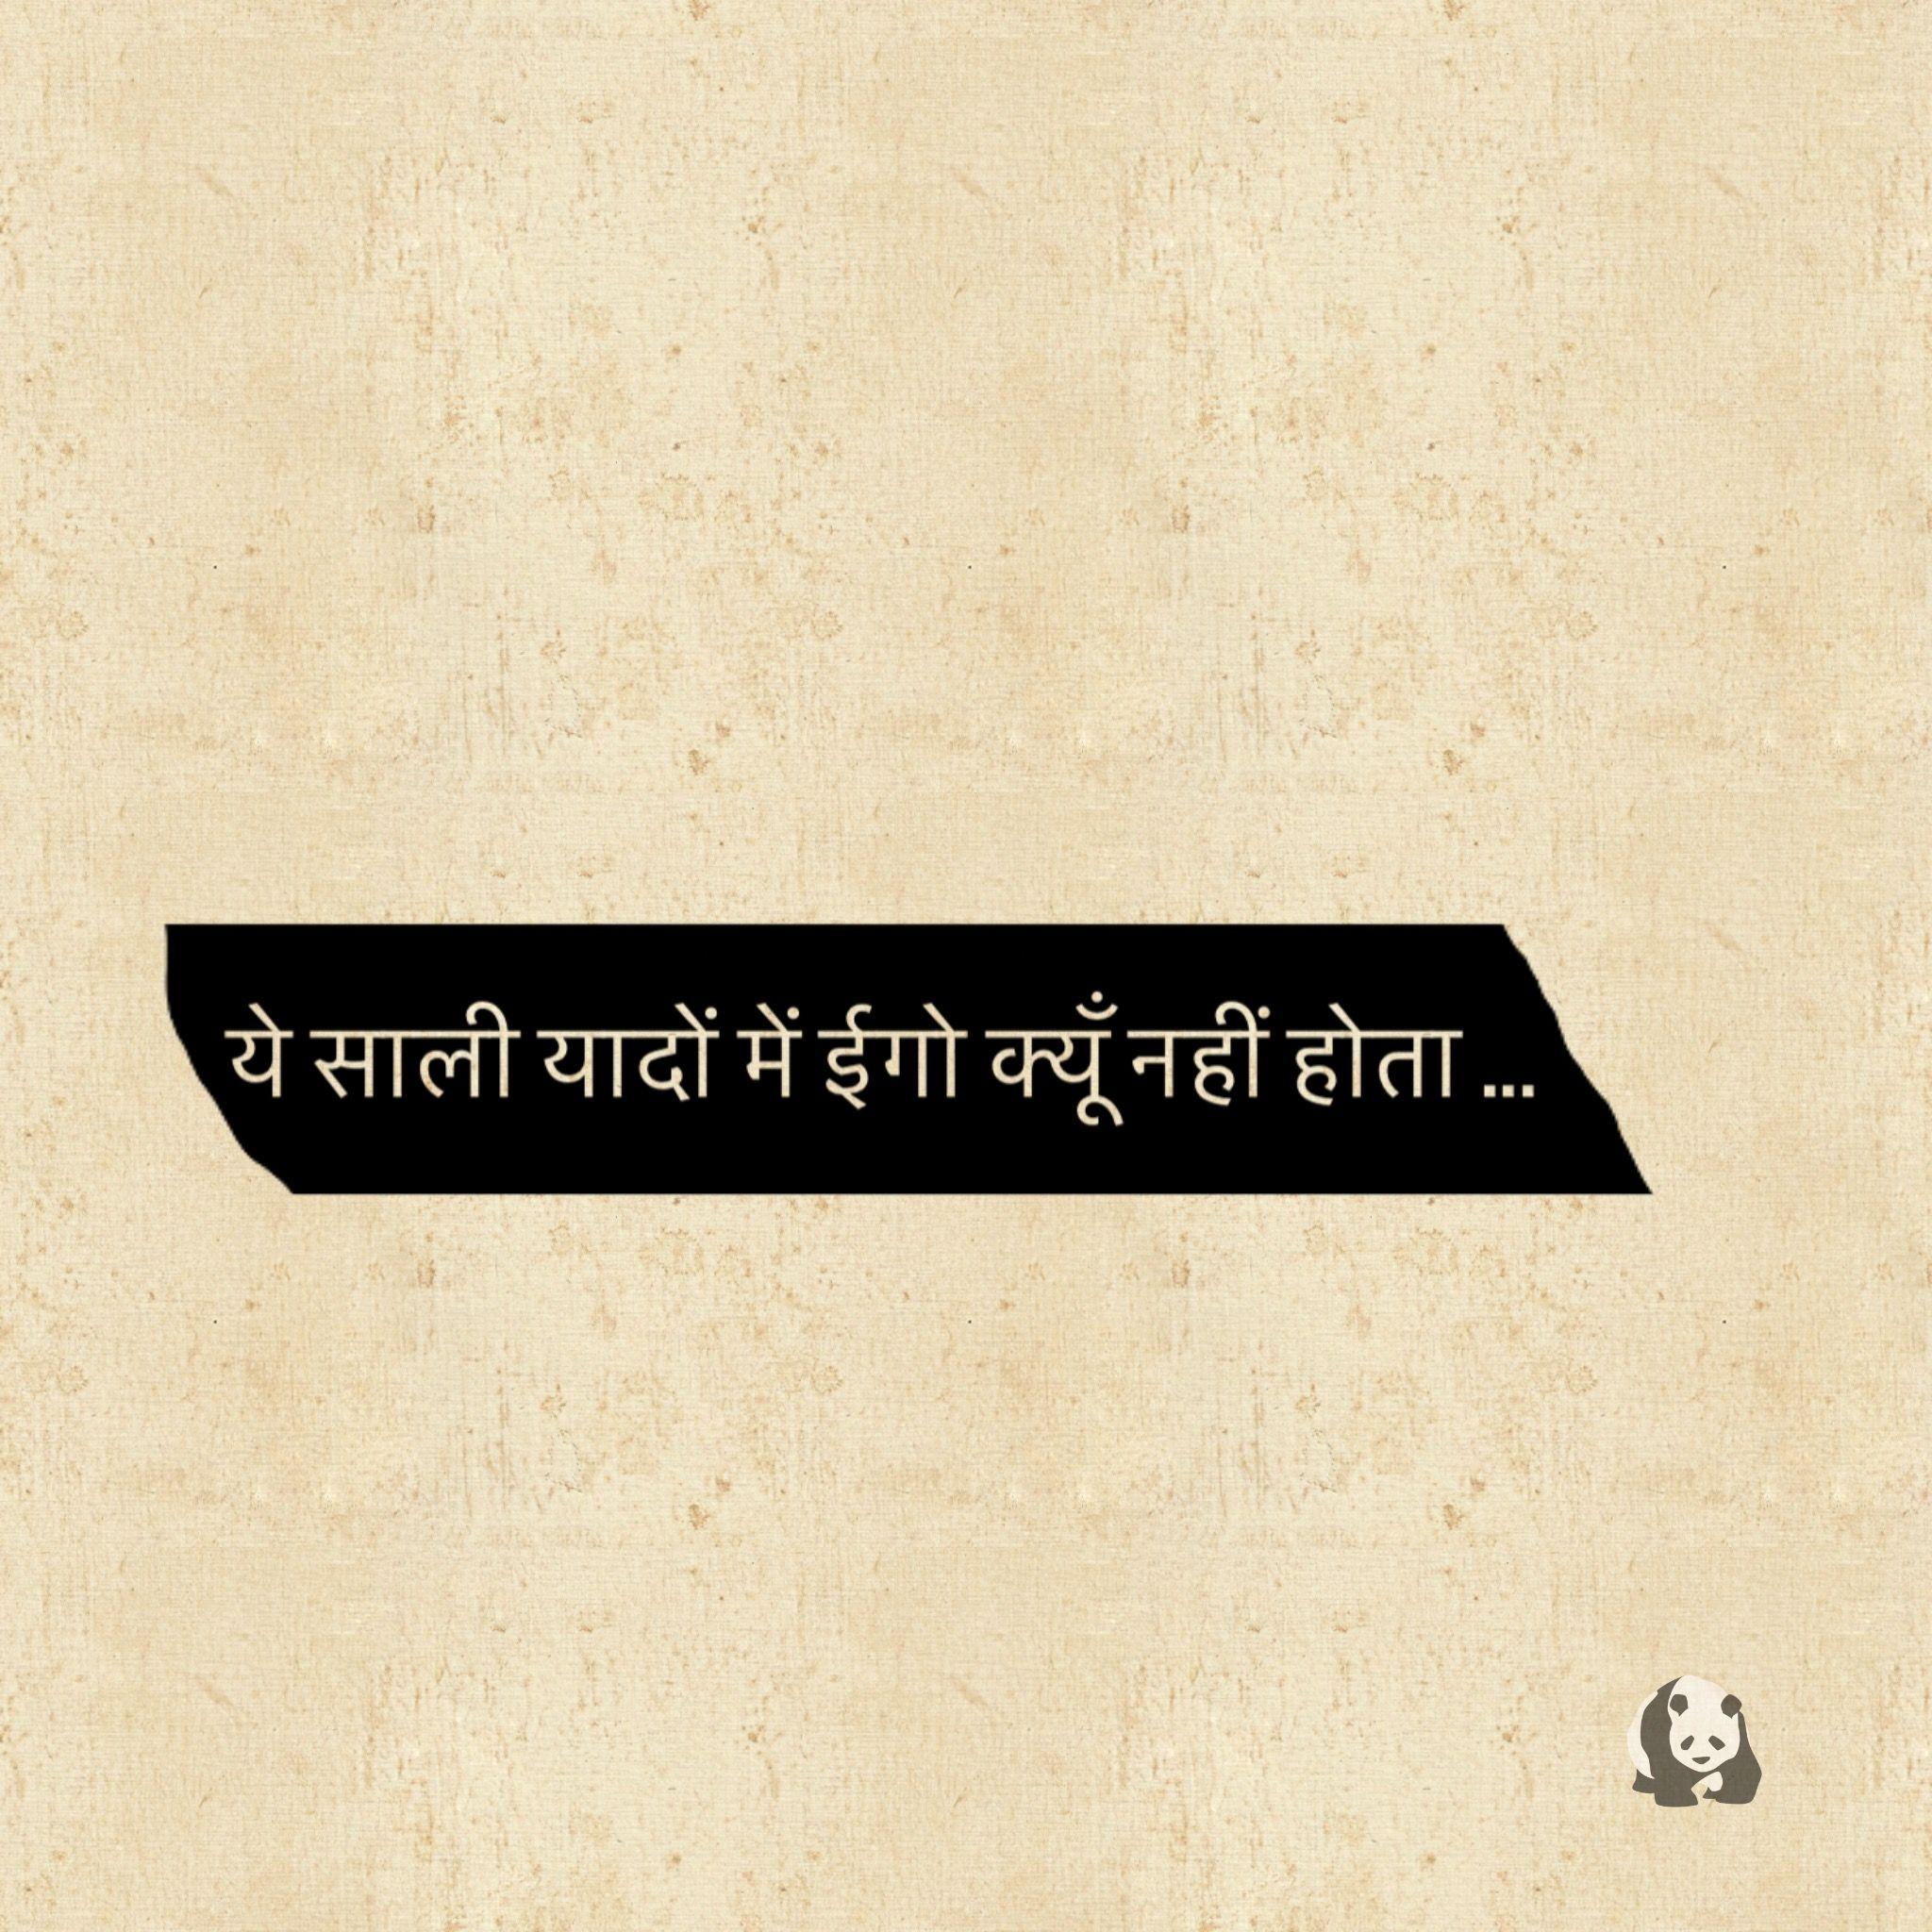 Pin By Nikita Sharma On Captions In 2020 Hindi Quotes Gulzar Quotes Life Quotes